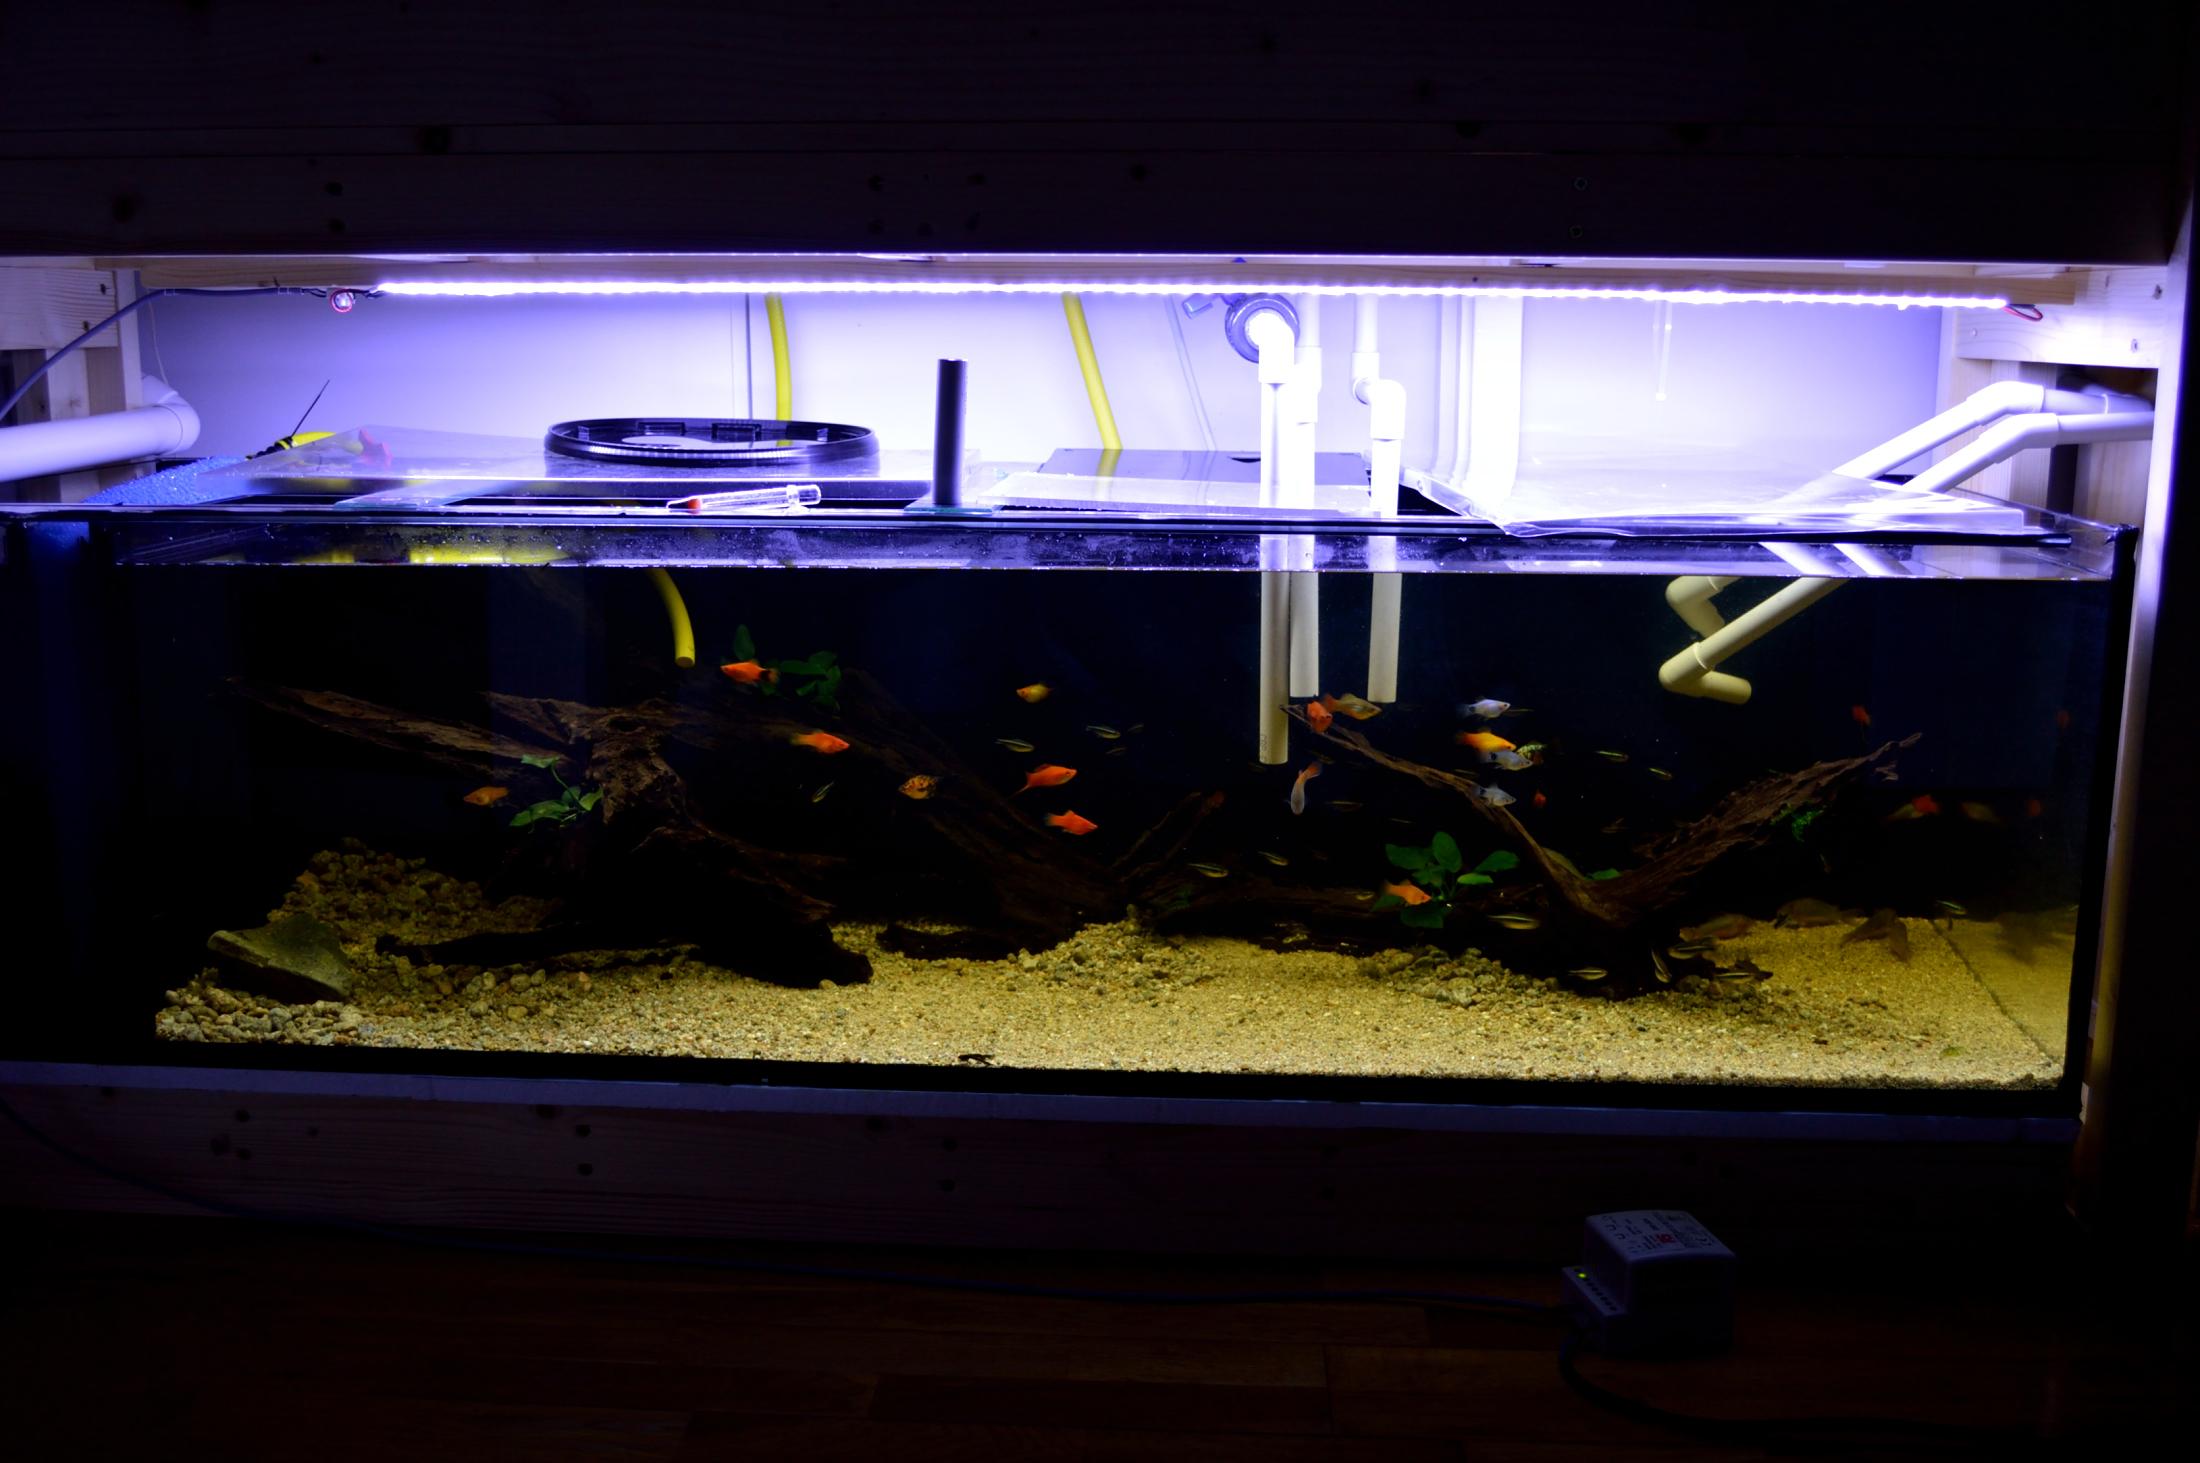 forum nicrew the tank now forums led planted lights aquarium light lighting